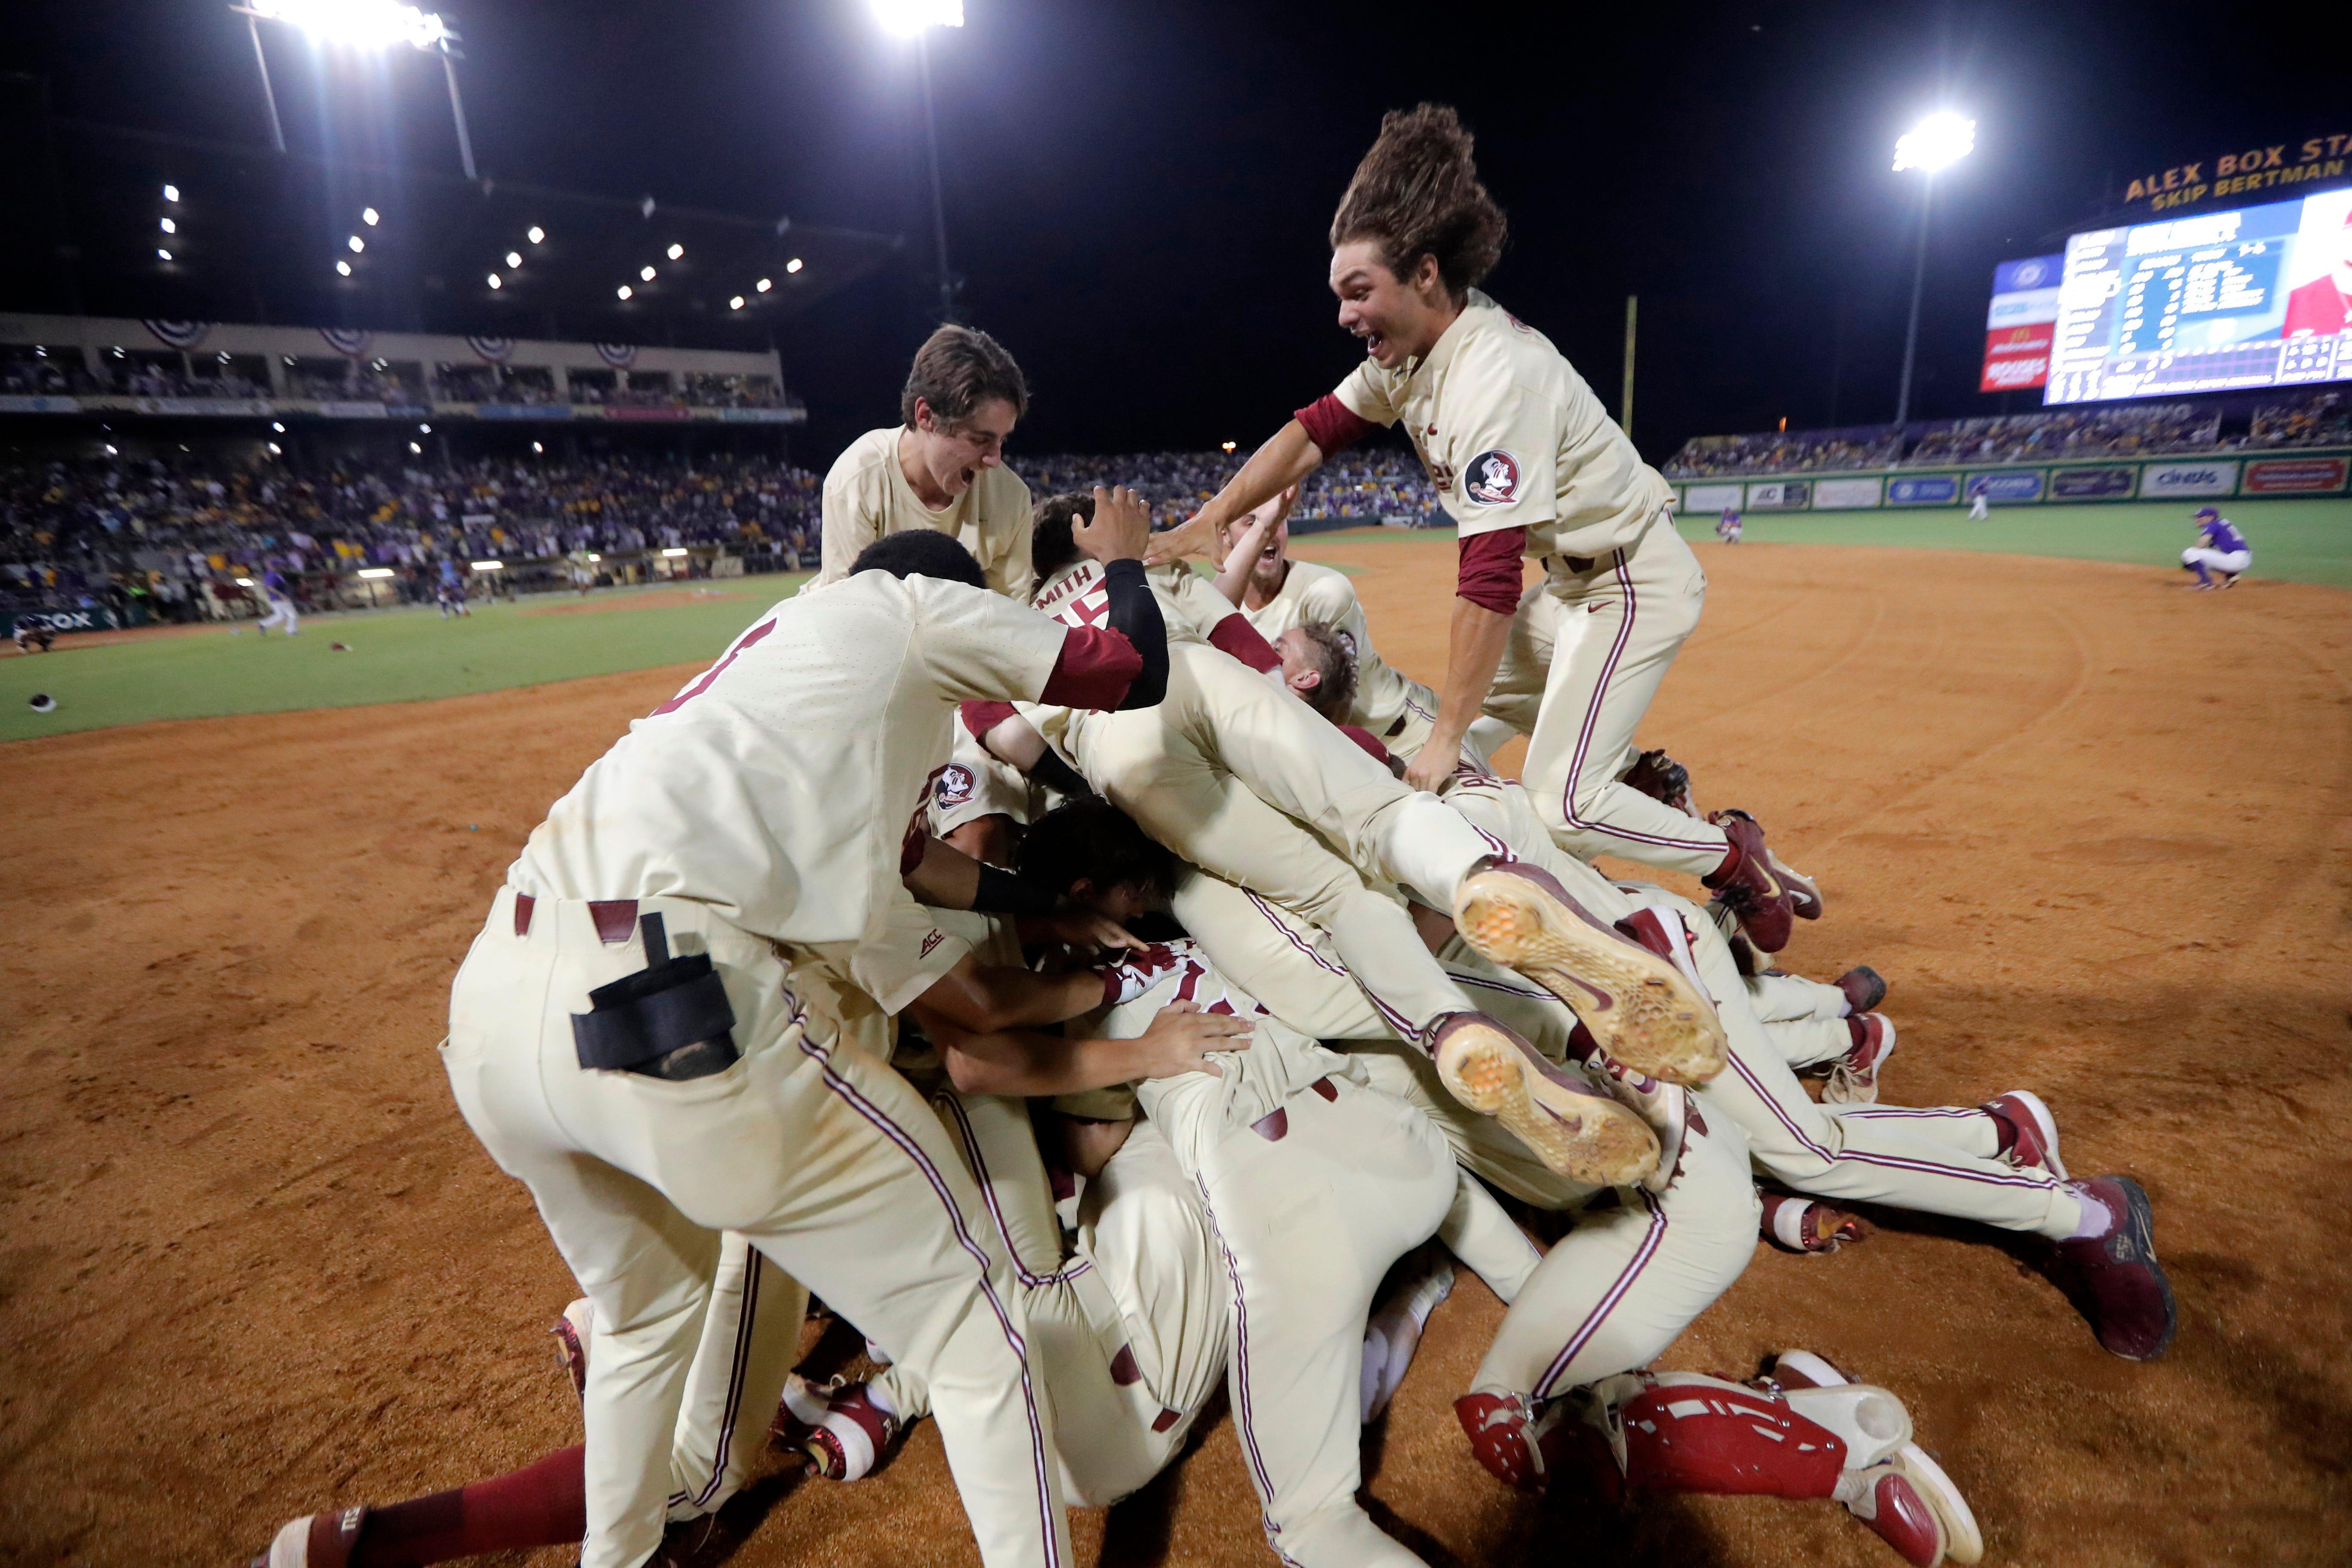 Former FSU players wishing Mike Martin, Seminoles good luck in College  World Series